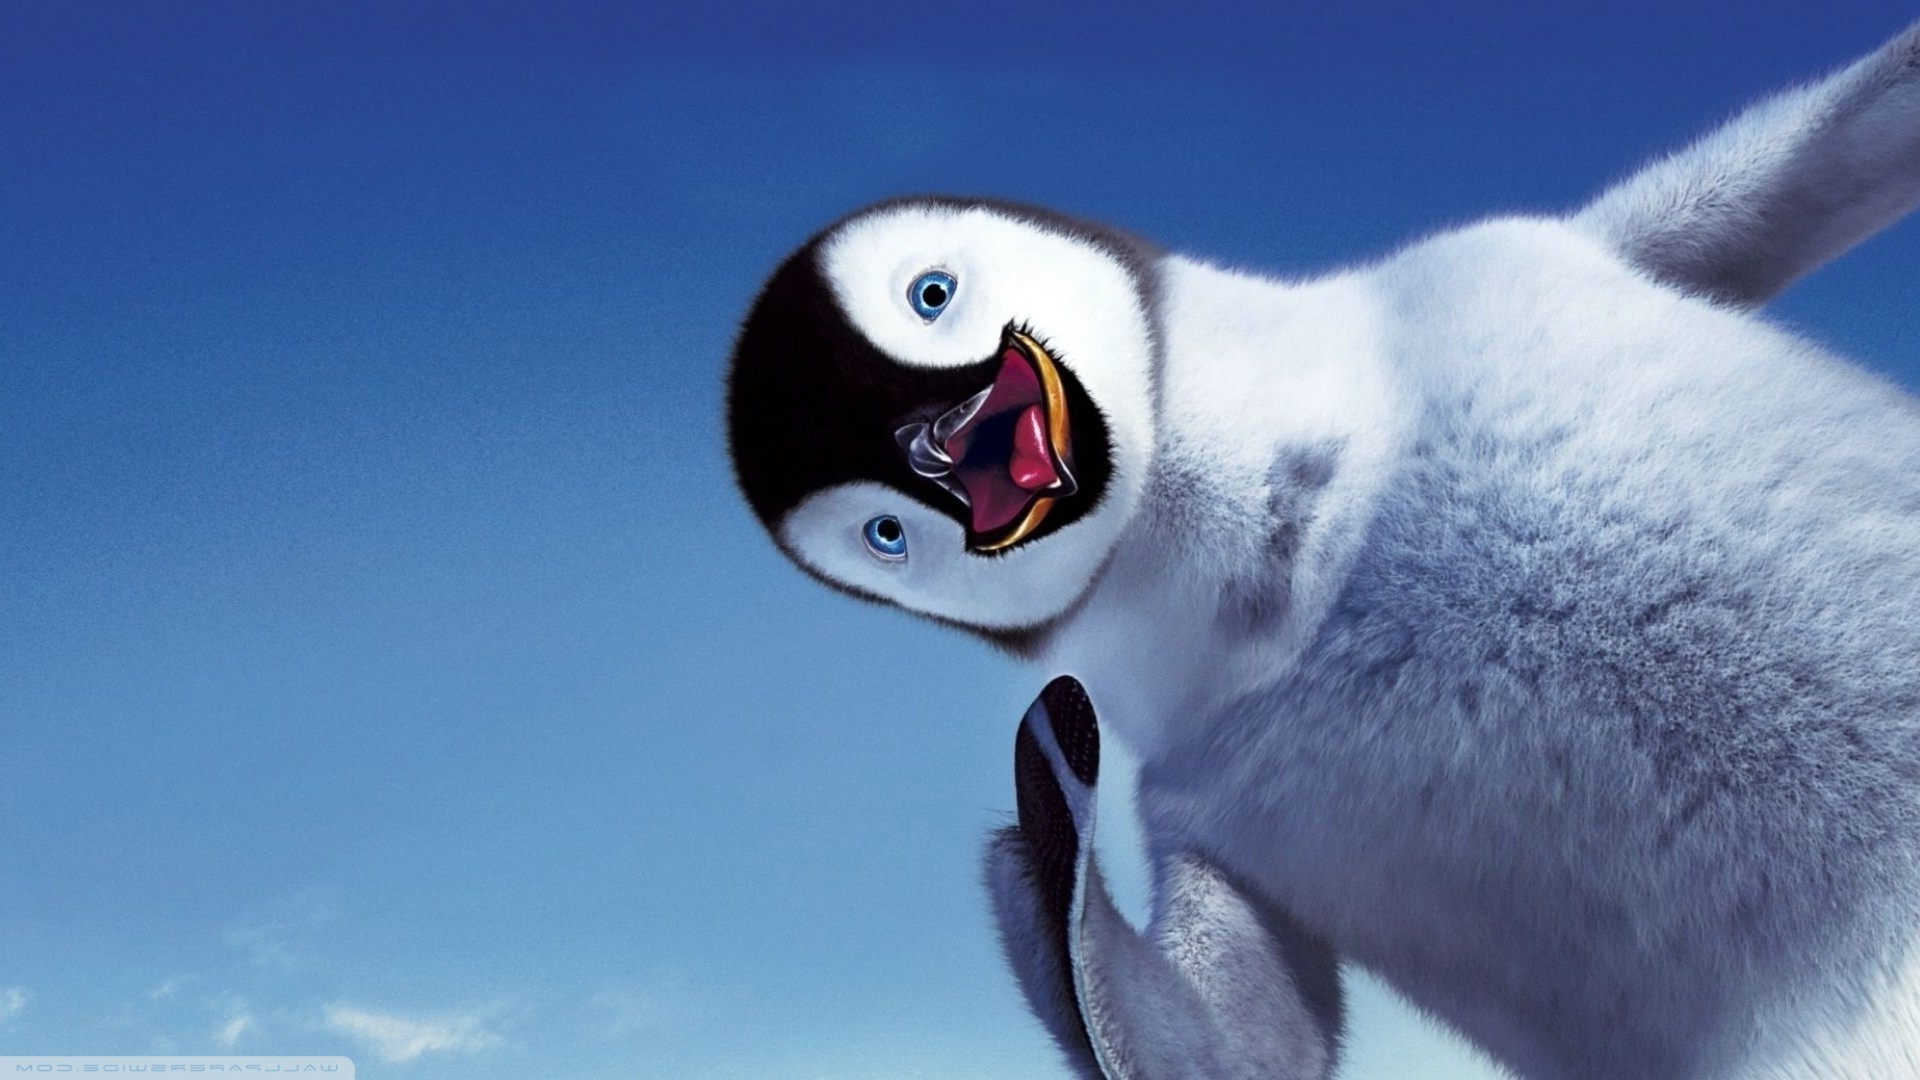 Картинка пингвины на рабочий стол